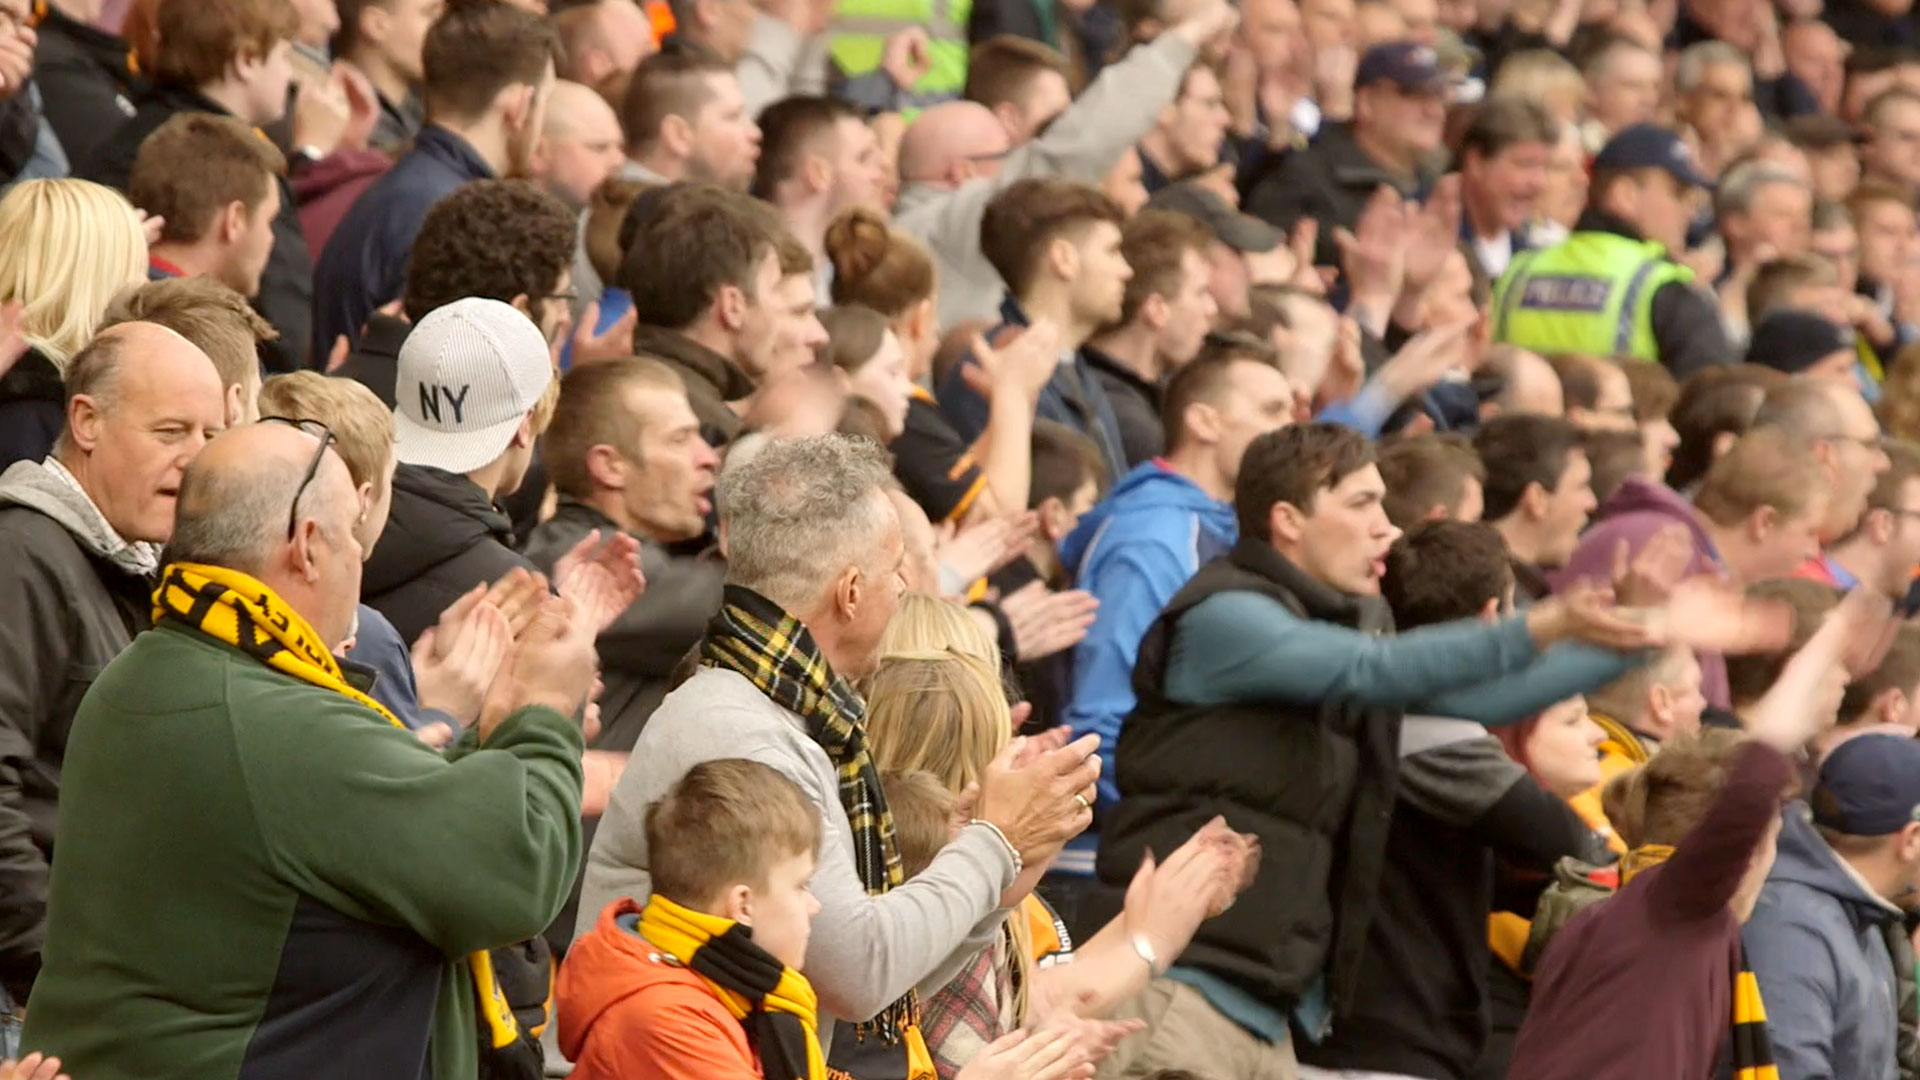 Football fans in the stadium